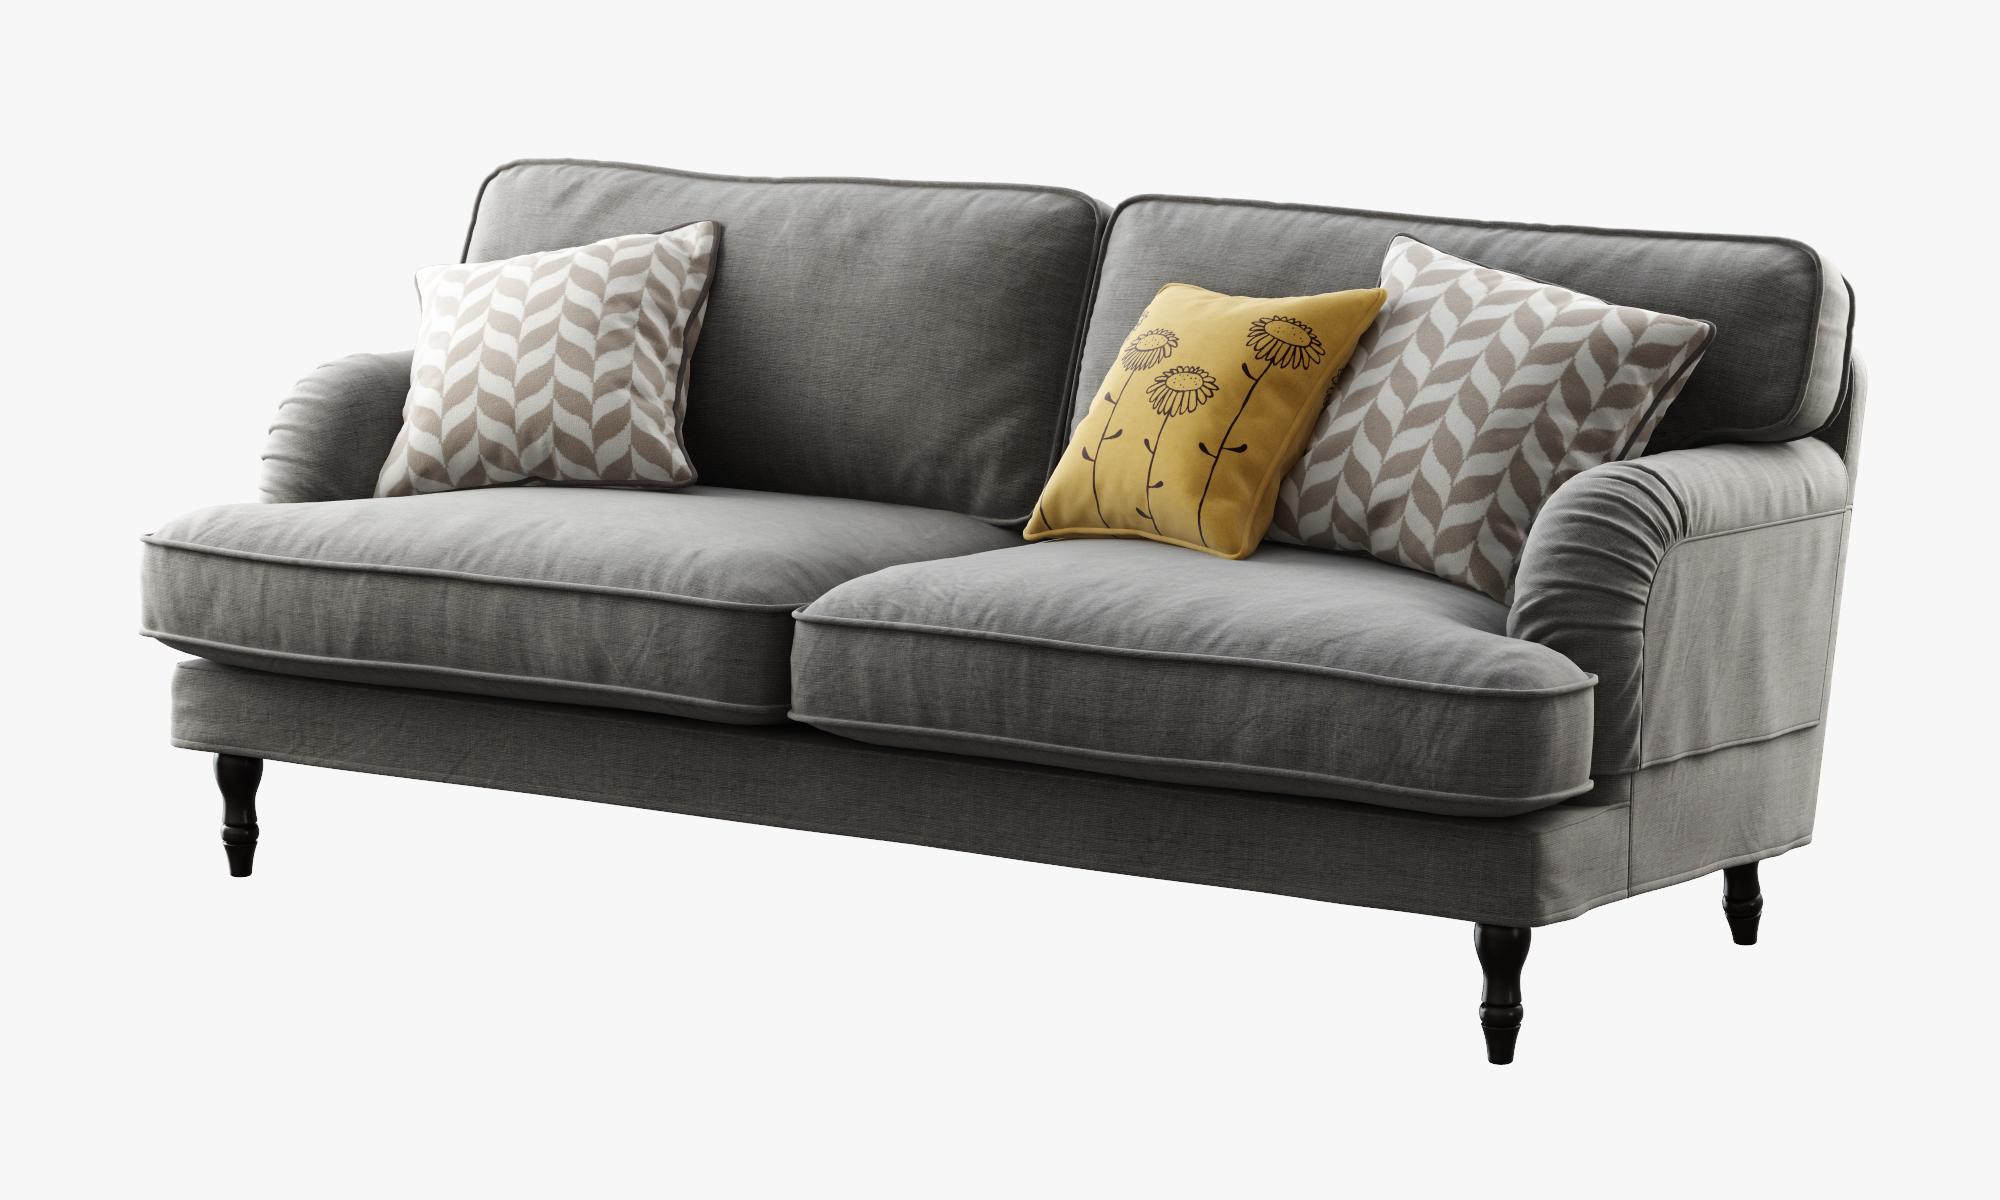 Enjoyable Ikea Stocksund Sofa Dailytribune Chair Design For Home Dailytribuneorg